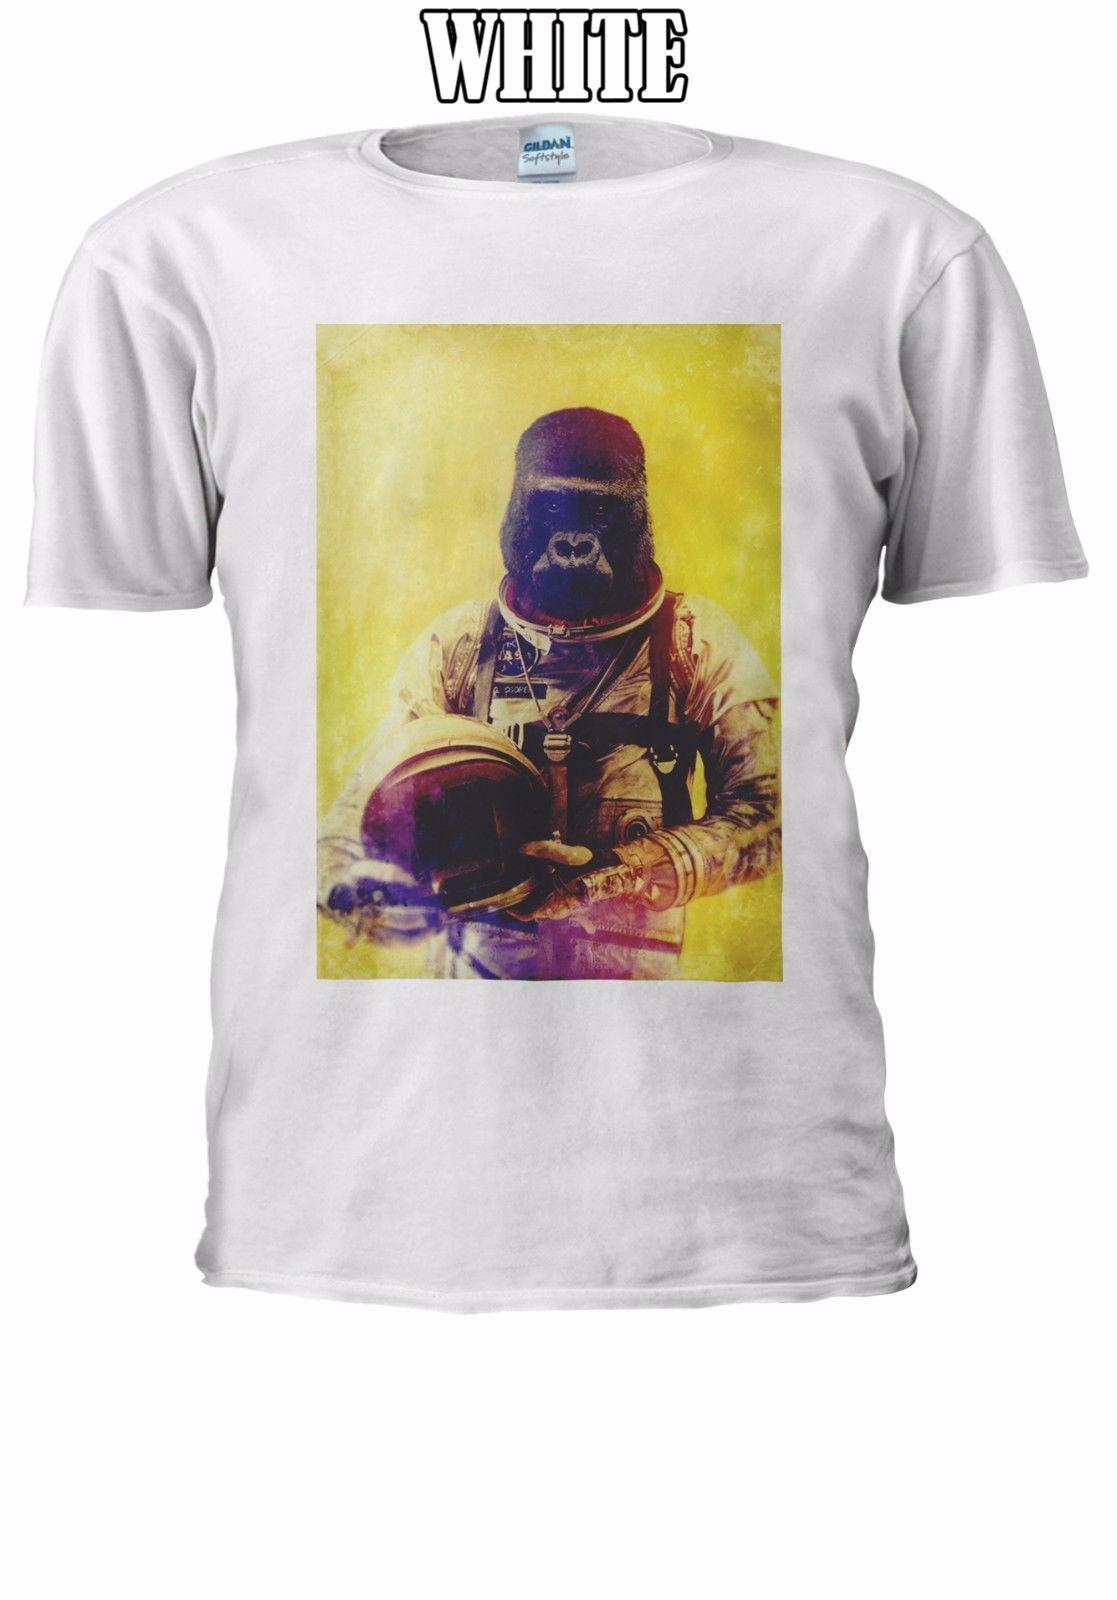 c83bb339 Astronaut Gorilla King Kong Space T Shirt Vest Tank Top Men Women Unisex  2455 Style Round Style Tshirt Tees Custom Jersey T Shirt T Shirt Designer  Graphic T ...